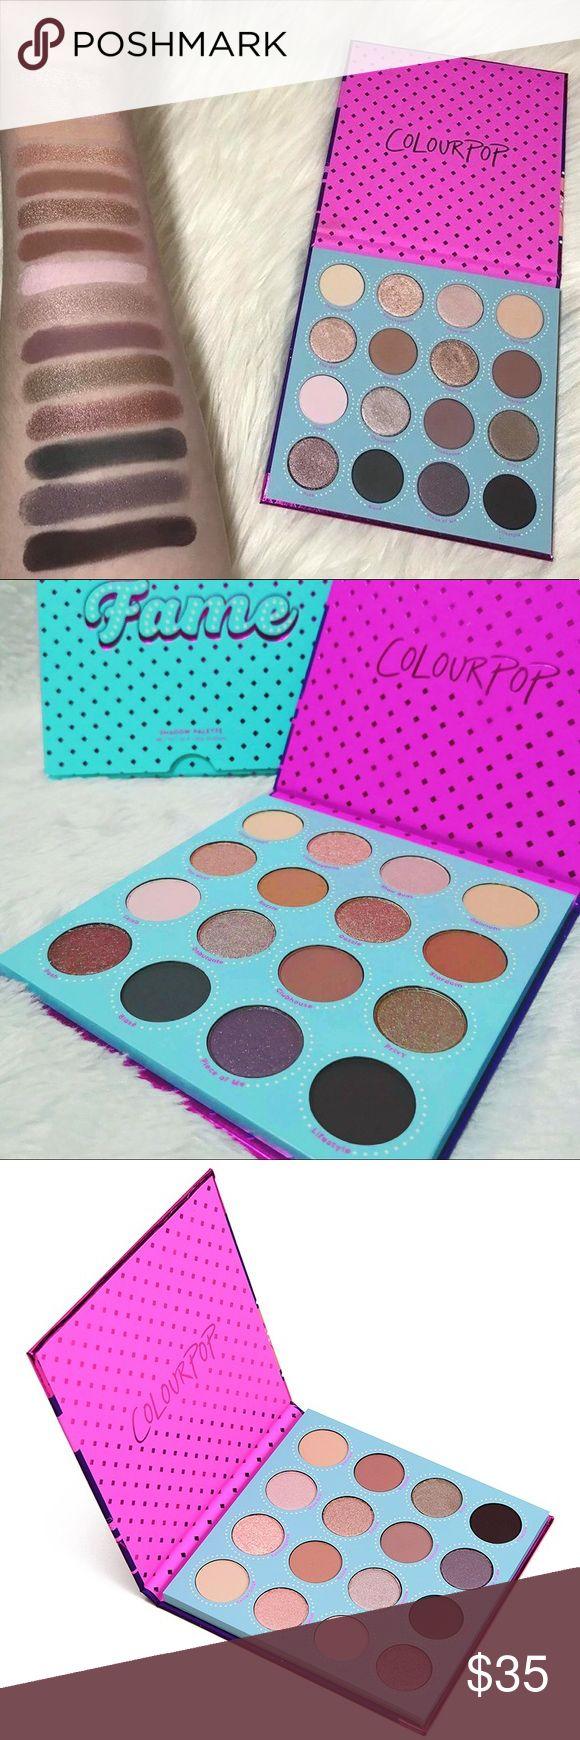 Colourpop FAME Eyeshadow Palette Colourpop, Eyeshadow